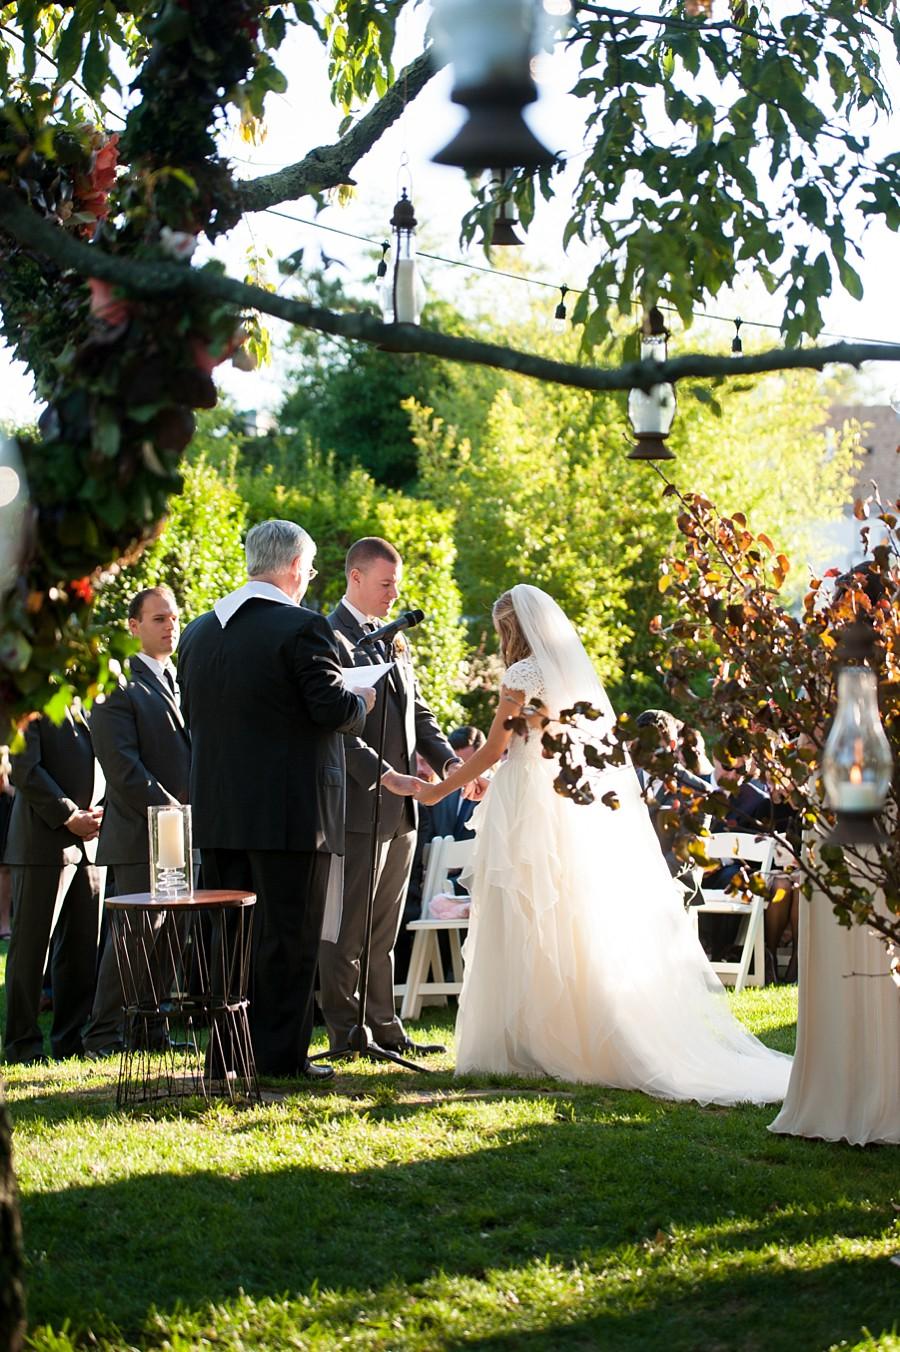 Sole_East_Montauk_Wedding_MS_56.jpg